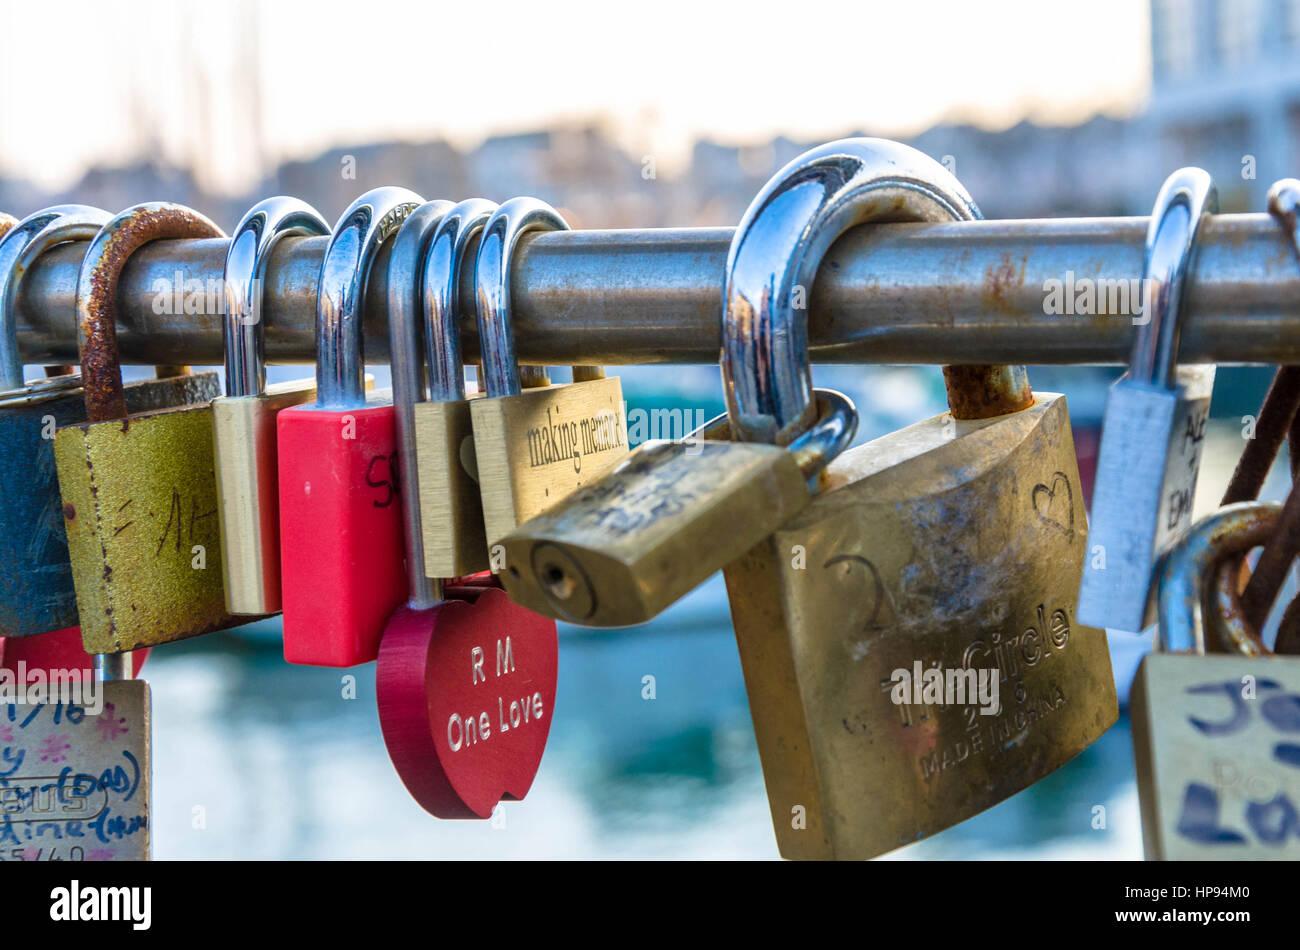 Love locks left on Pero's Bridge which spans Bristol Harbour. Romantic tourists leave padlocks on the bridge - Stock Image